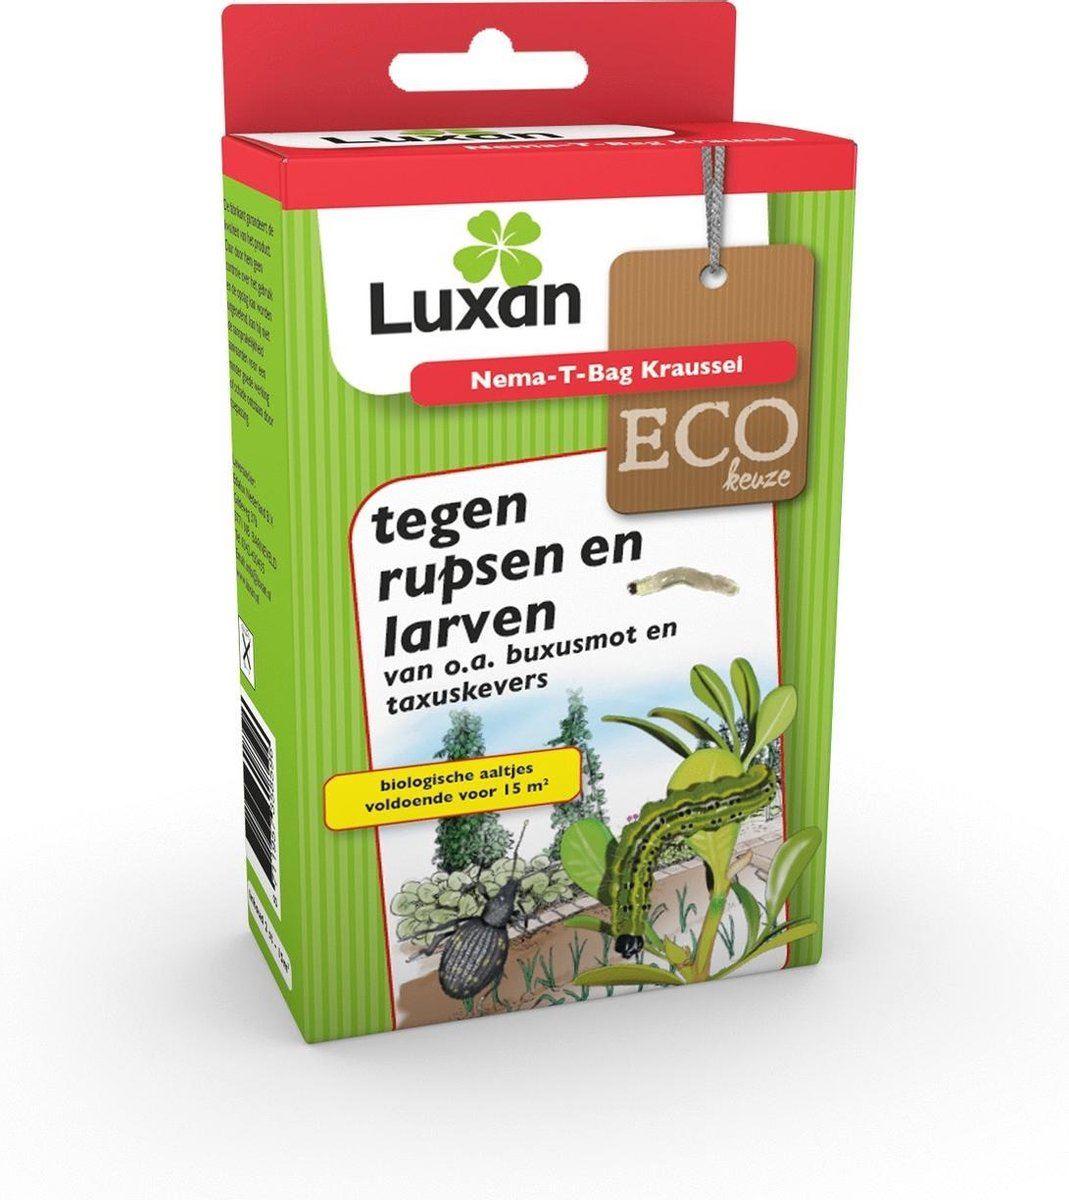 Luxan Nematoden taxuskever, buxusmot kraussei 1 stuk (max 15 m²)